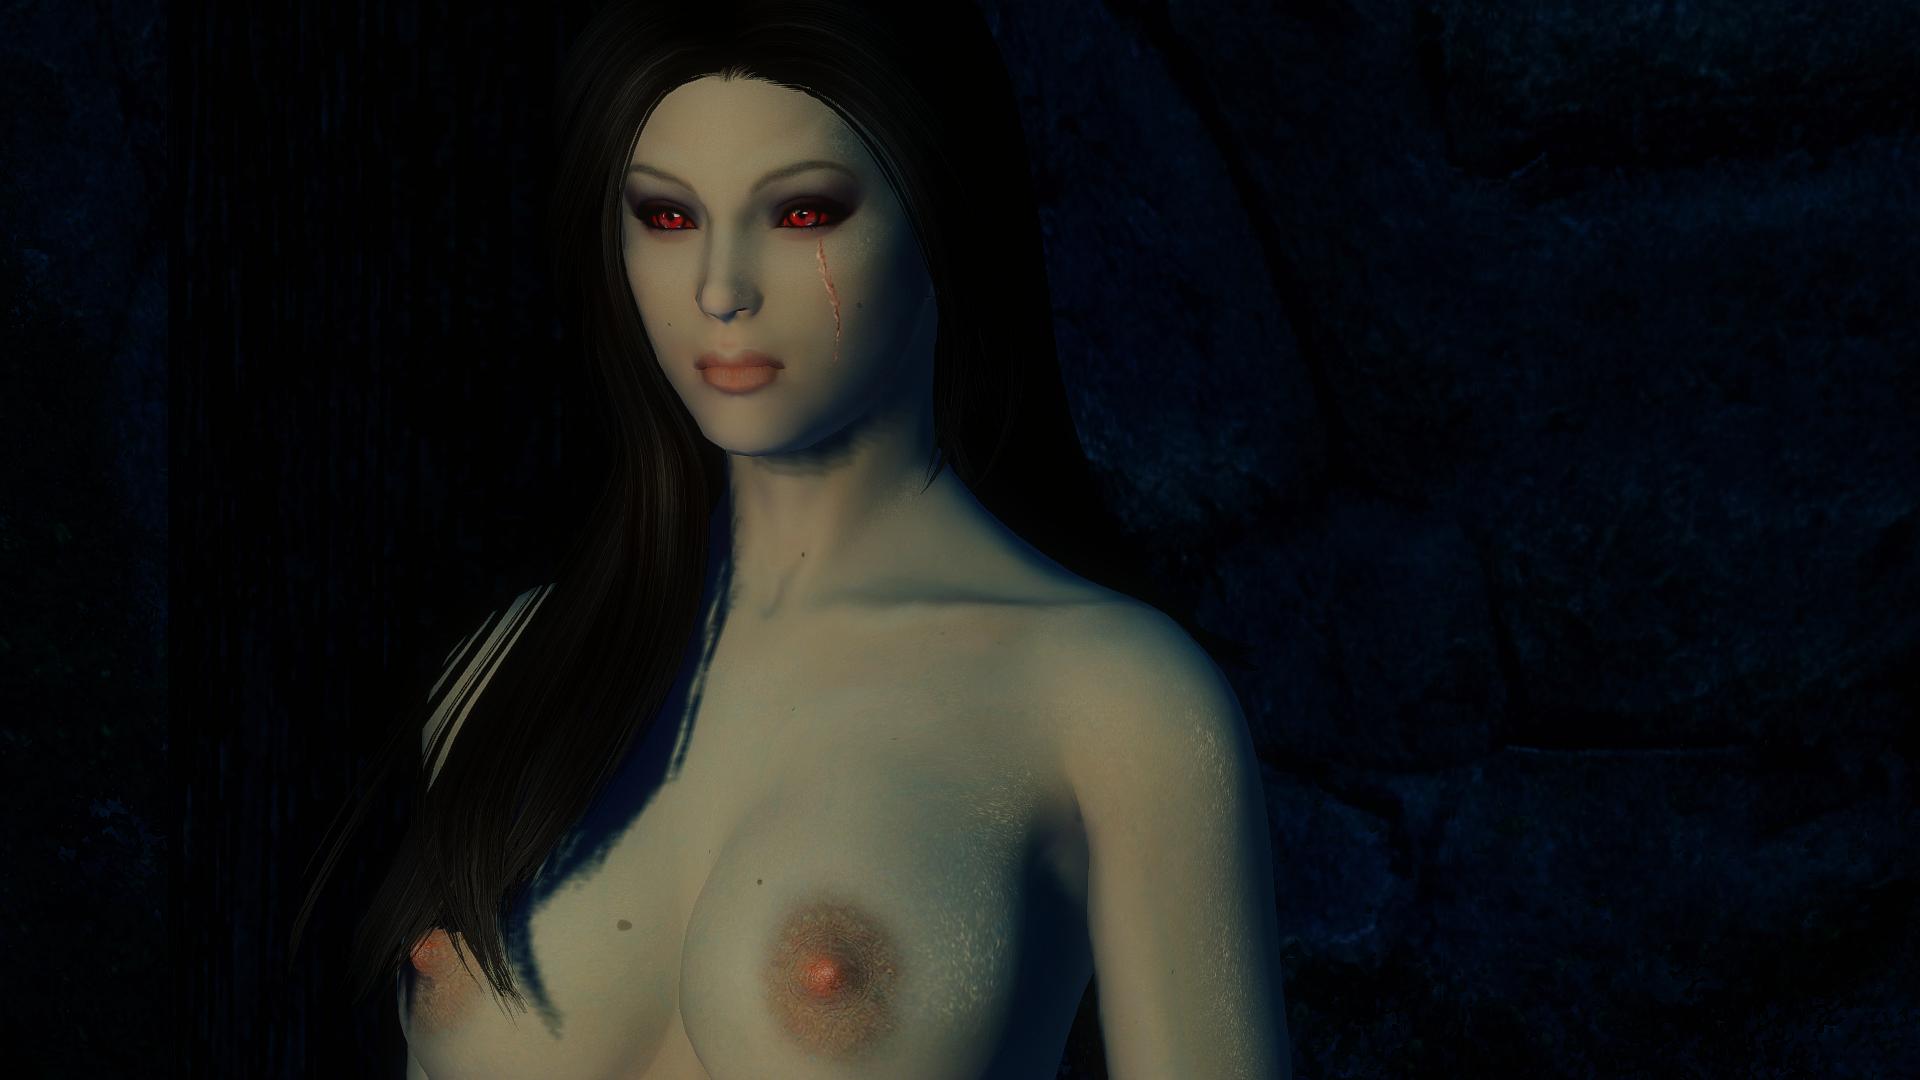 skyrim_sse_yg_dark_elf_dusk_4_by_silvist